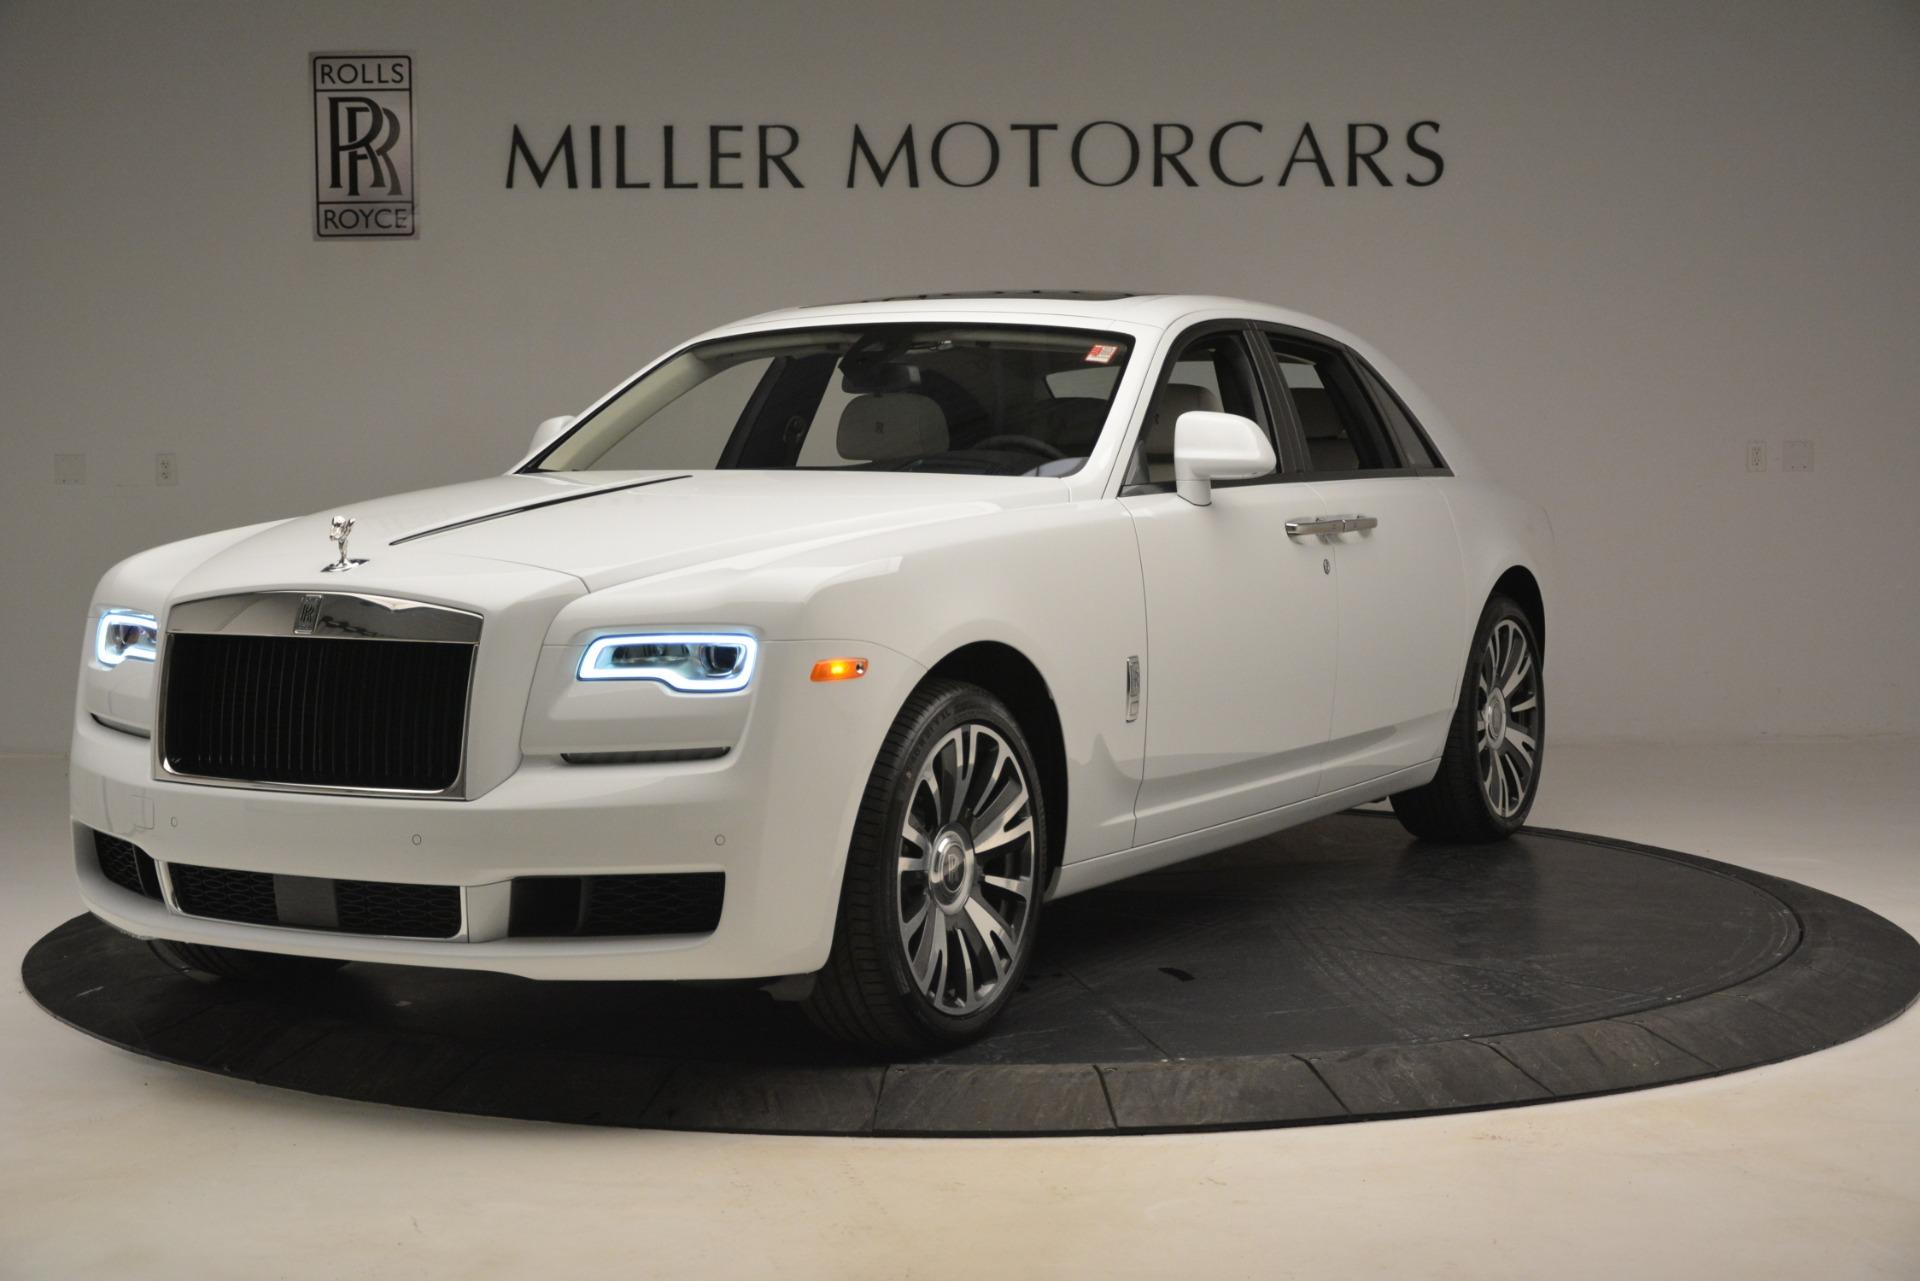 Used 2019 Rolls-Royce Ghost for sale $298,900 at Rolls-Royce Motor Cars Greenwich in Greenwich CT 06830 1